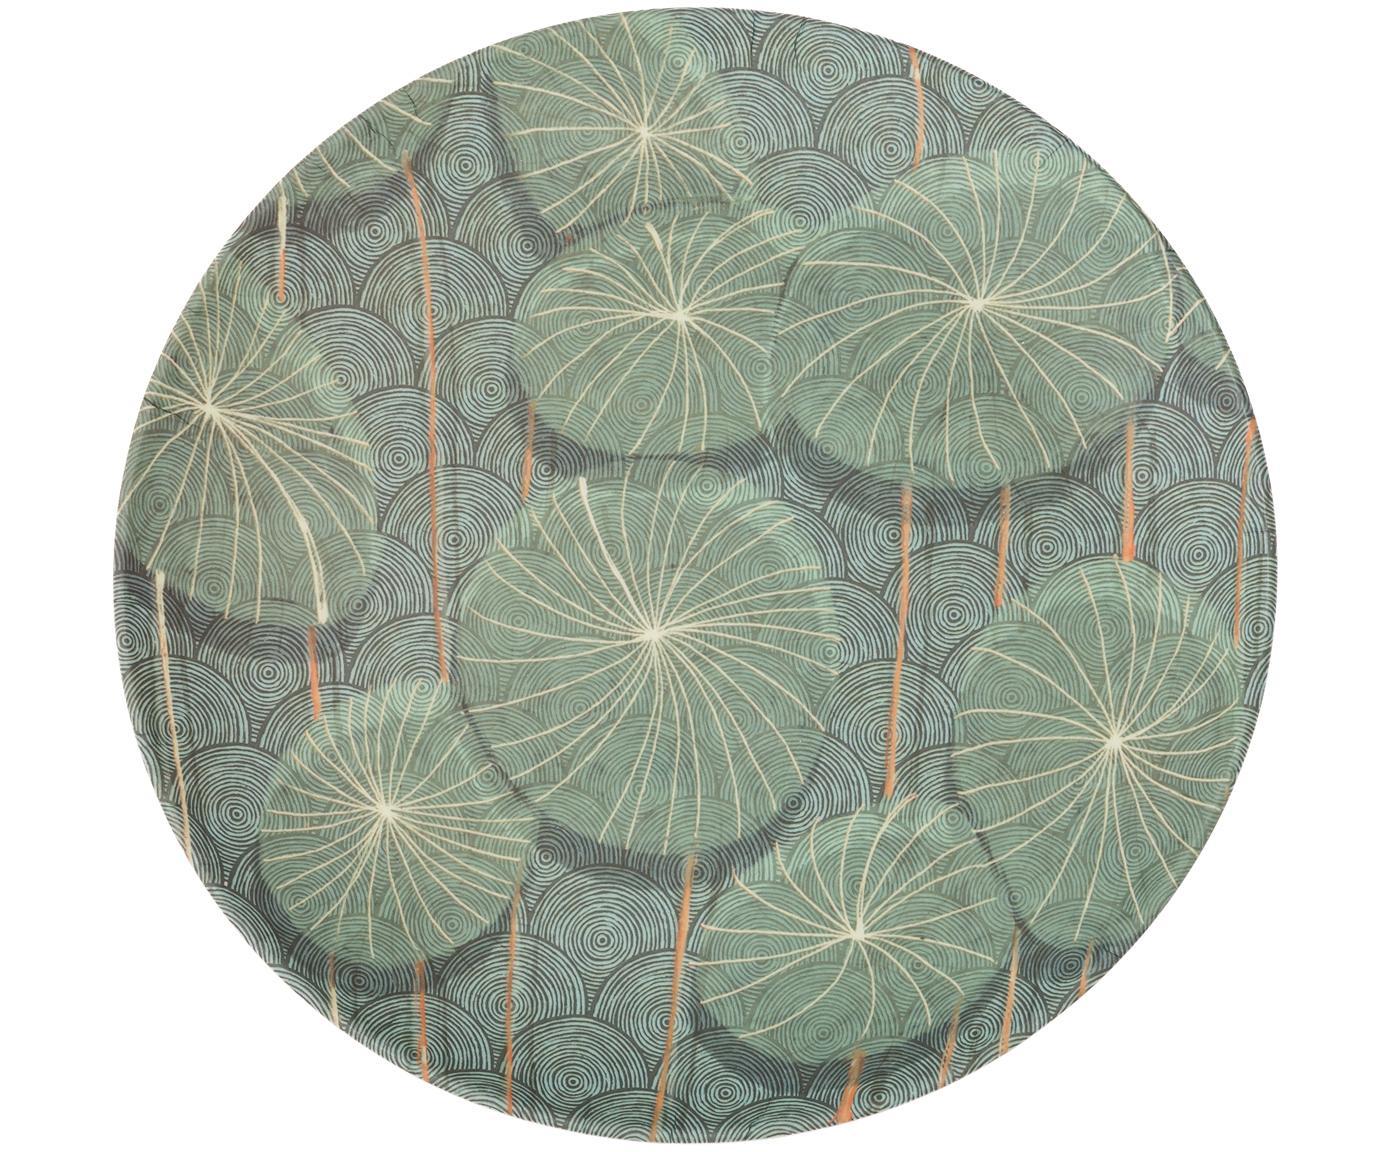 Plato postre de bambú Nymphaea, Fibras de bambú, pintado, Azul, verde, Ø 20 x Al 2 cm